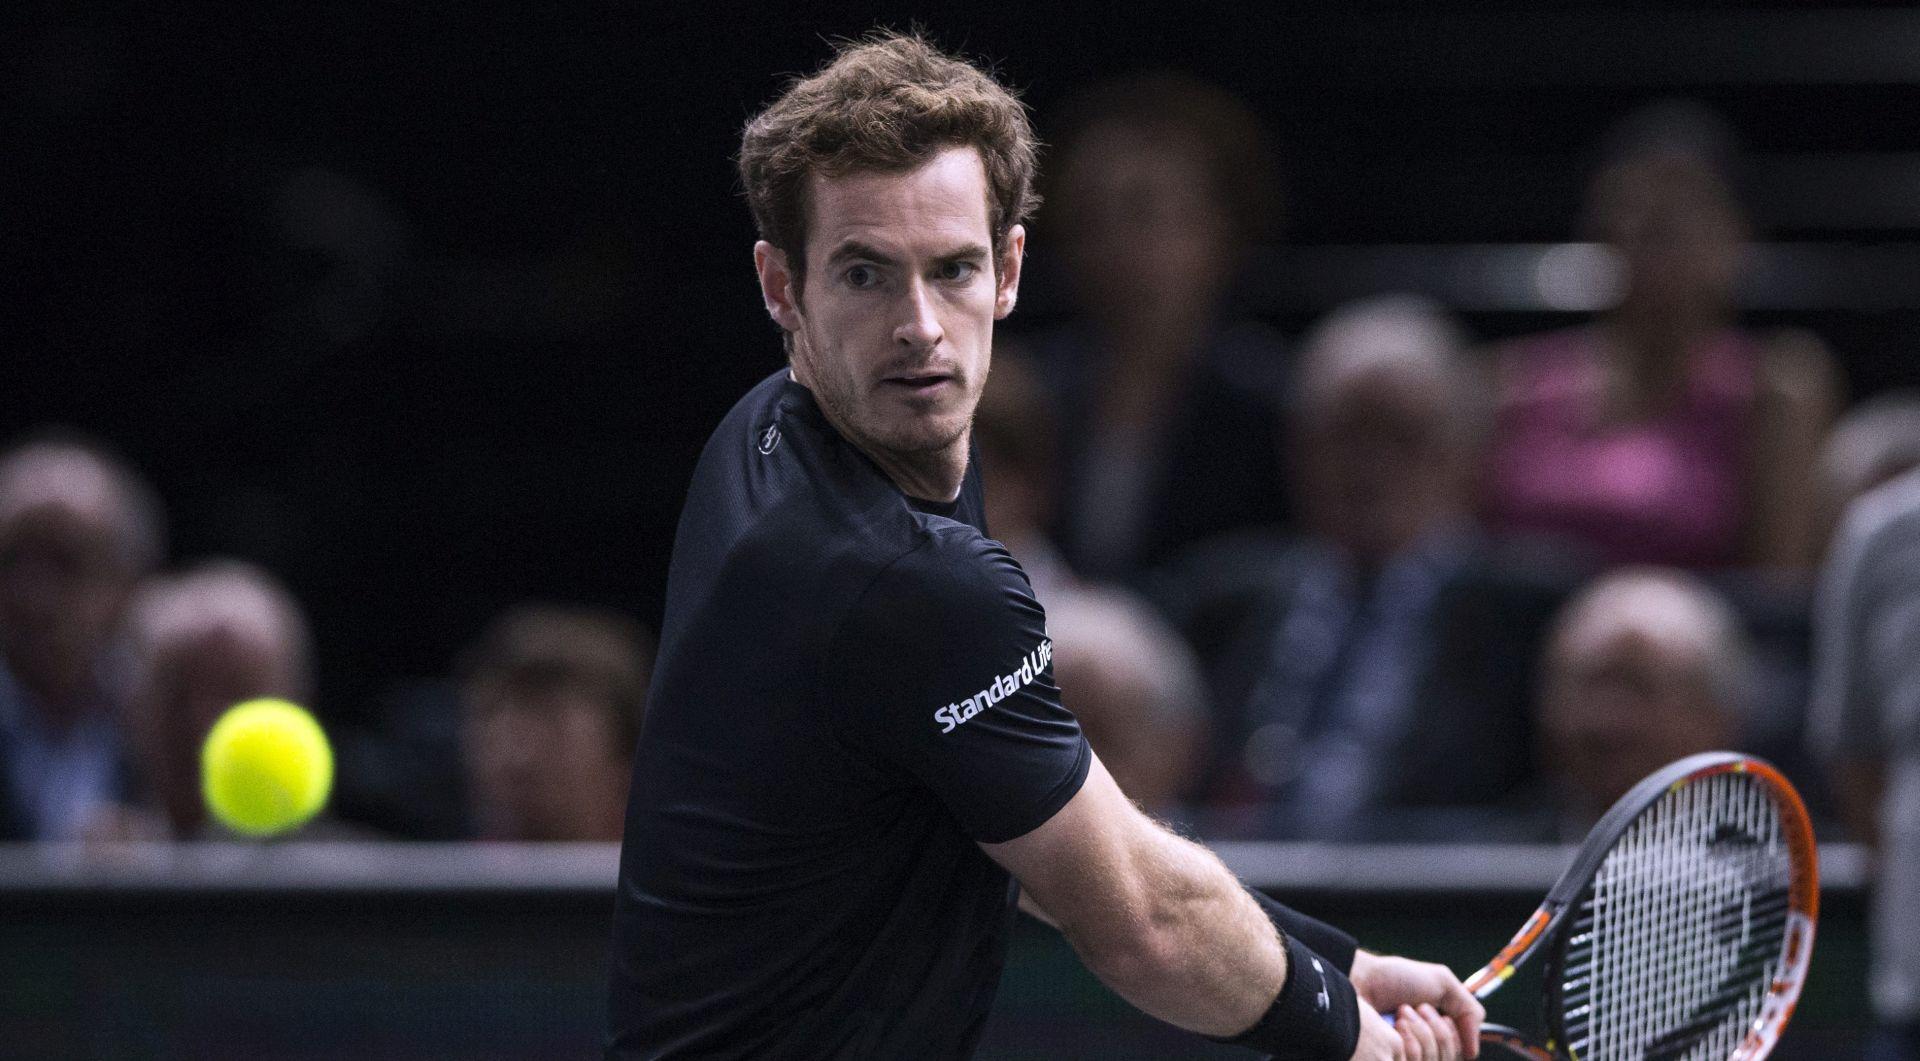 ATP PARIZ Andy Murray prvi finalist, čeka Đokovića ili Wawrinku